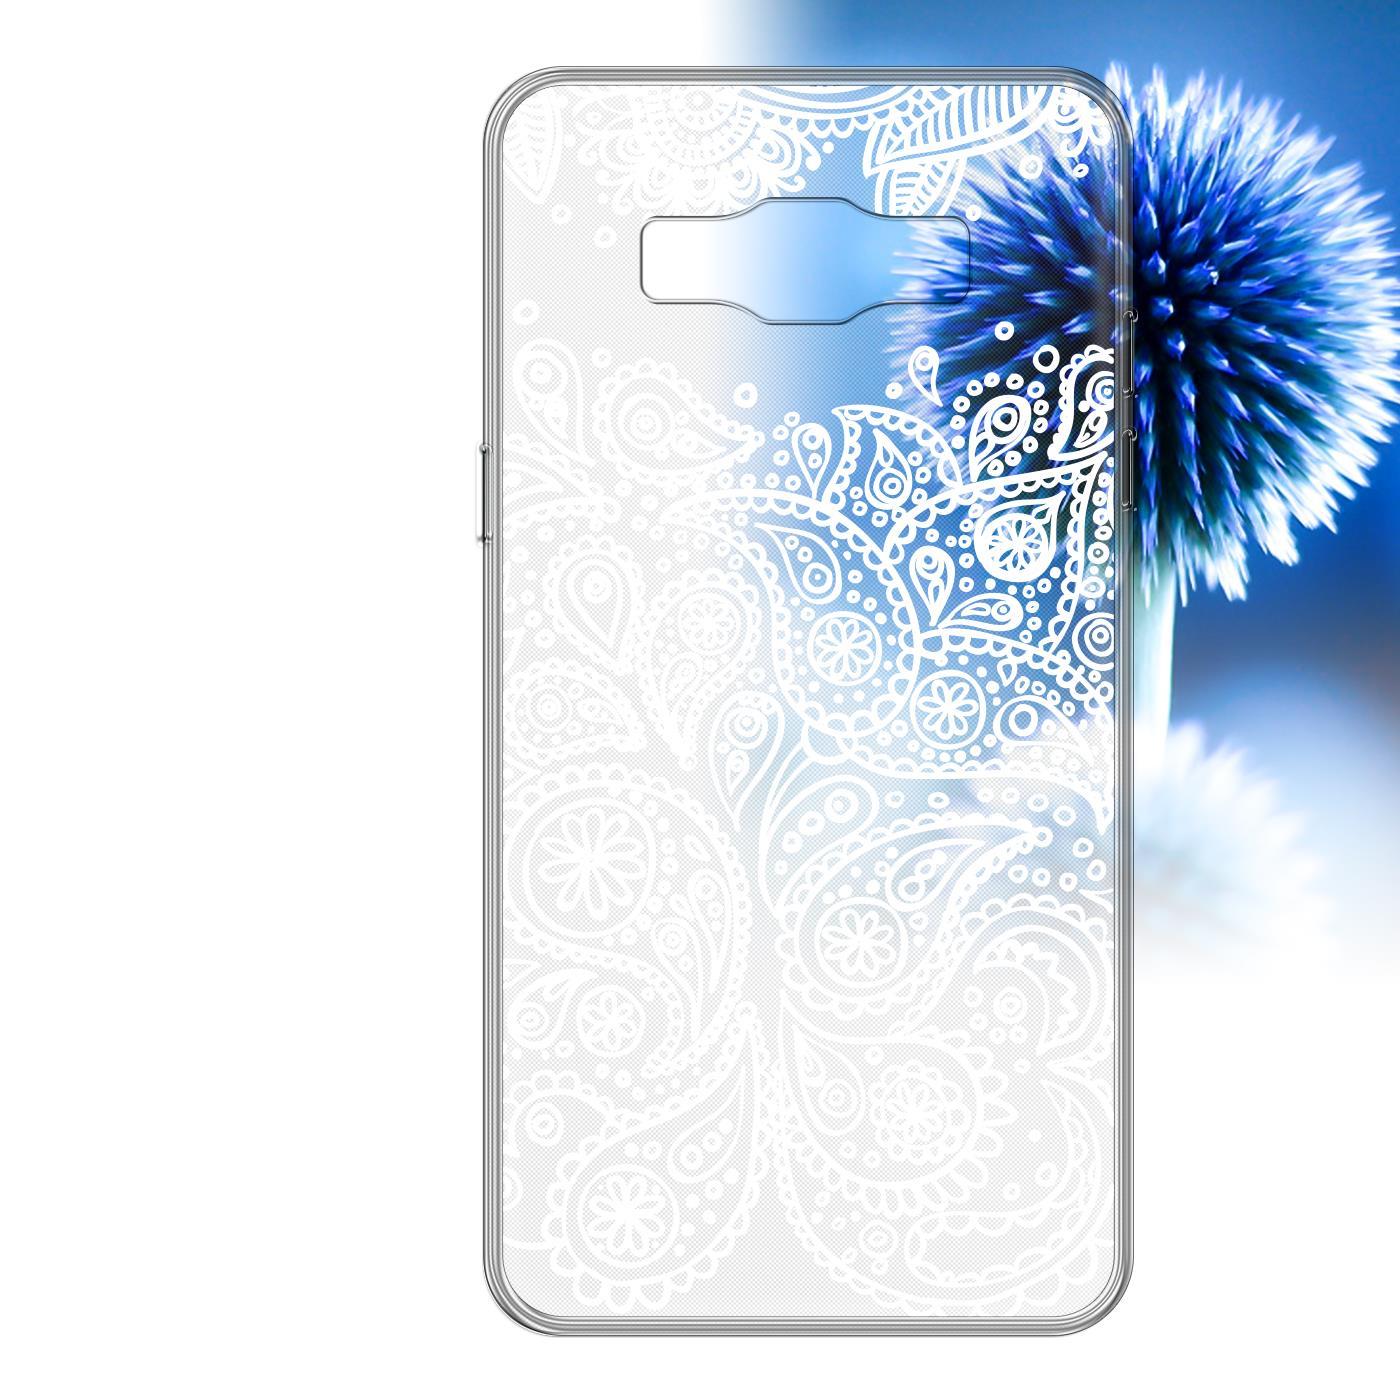 Samsung Galaxy J5 2015 Handy Schutz Hülle Case TPU Silikon Cover Tasche Mandala